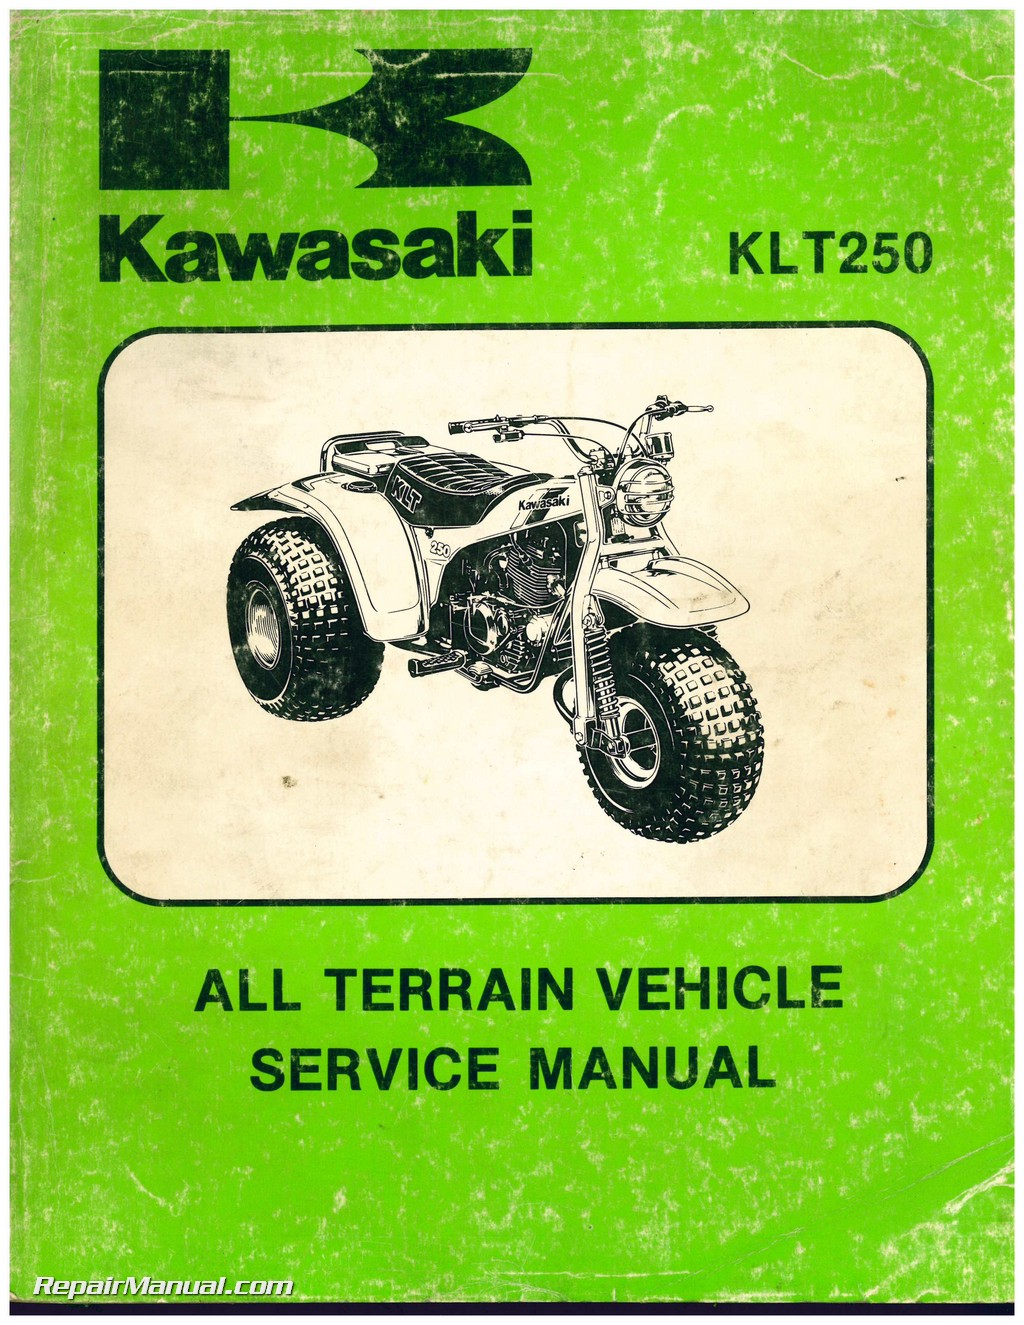 hight resolution of 1982 kawasaki klt250 a1 3 wheel atc printed service manual rh repairmanual com wiring diagram for